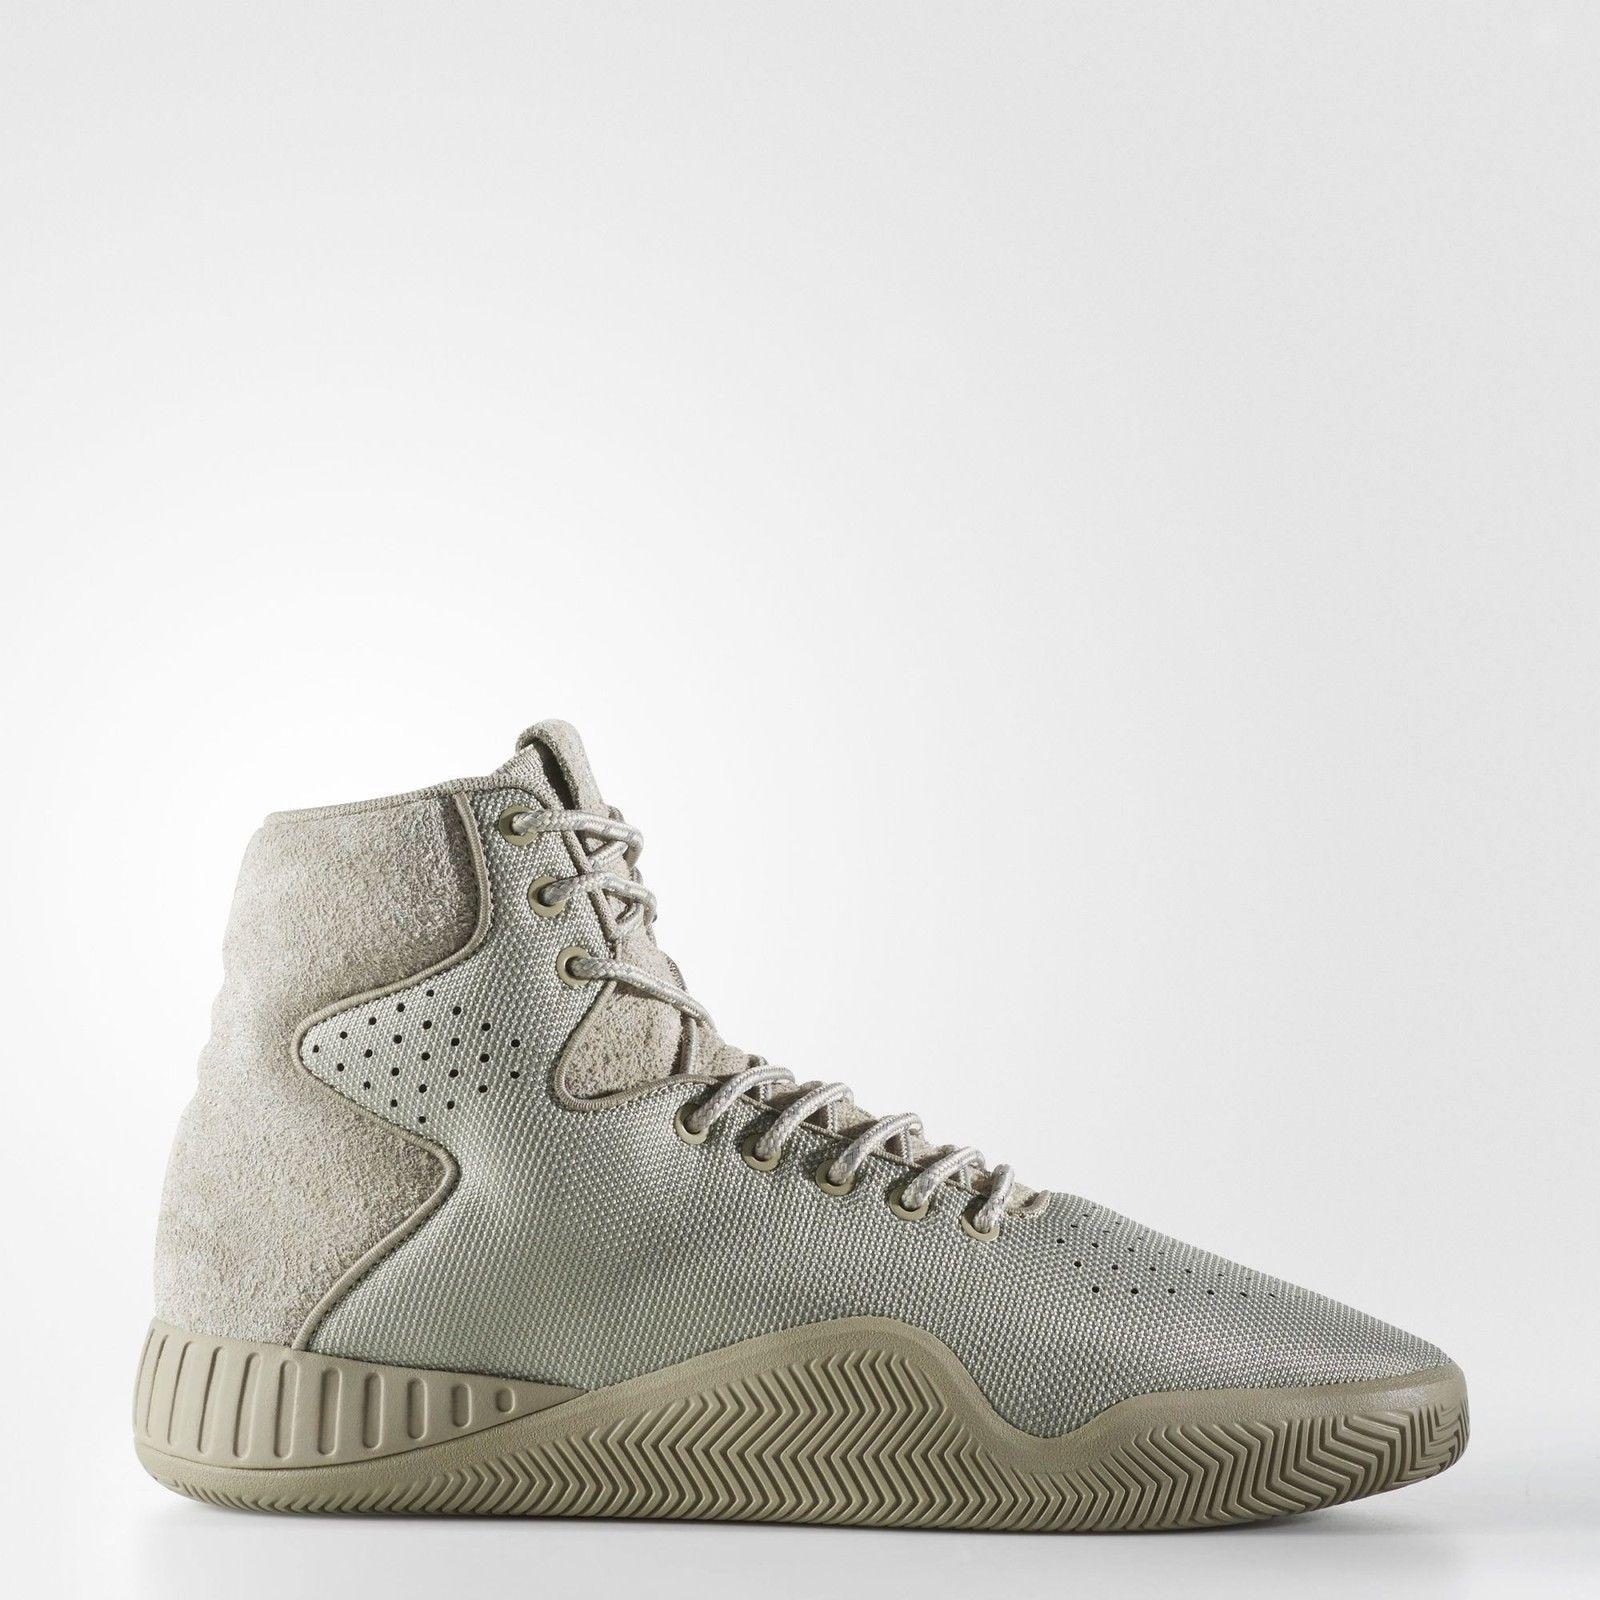 Adidas Tubular Instinct Men's Shoes Beige $36